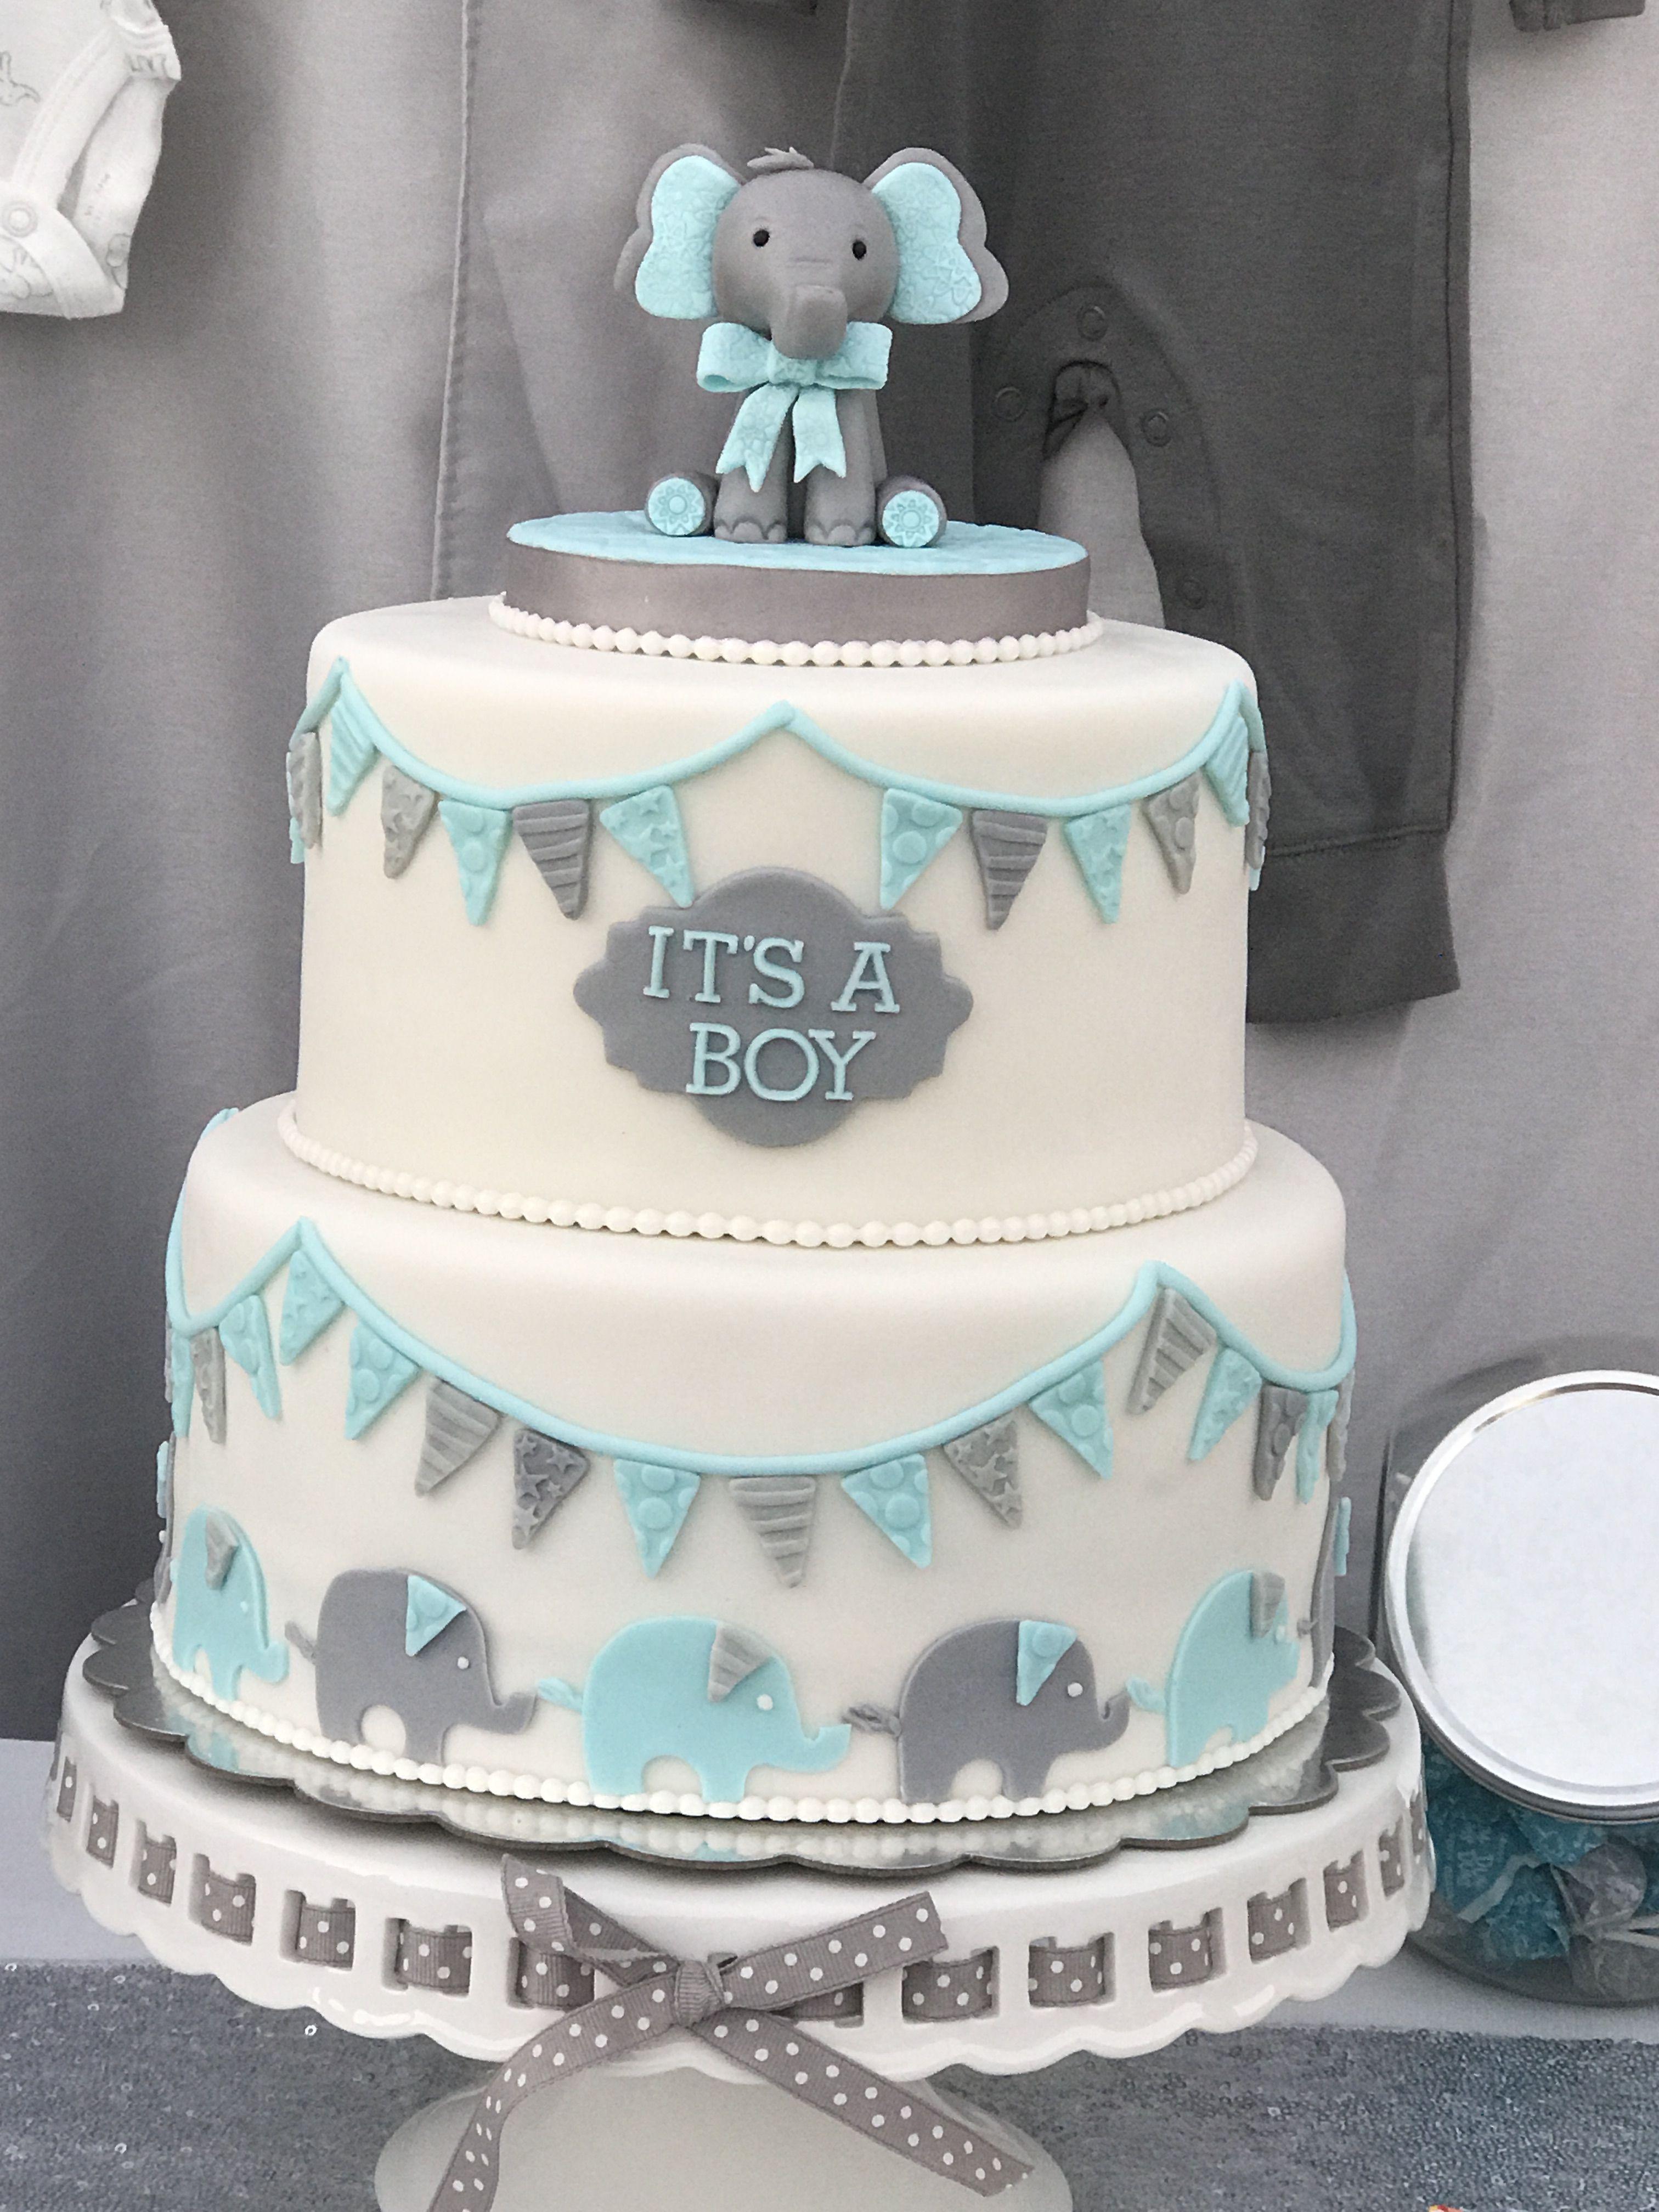 Baby elephant little peanut cake | baby shower ideas ...